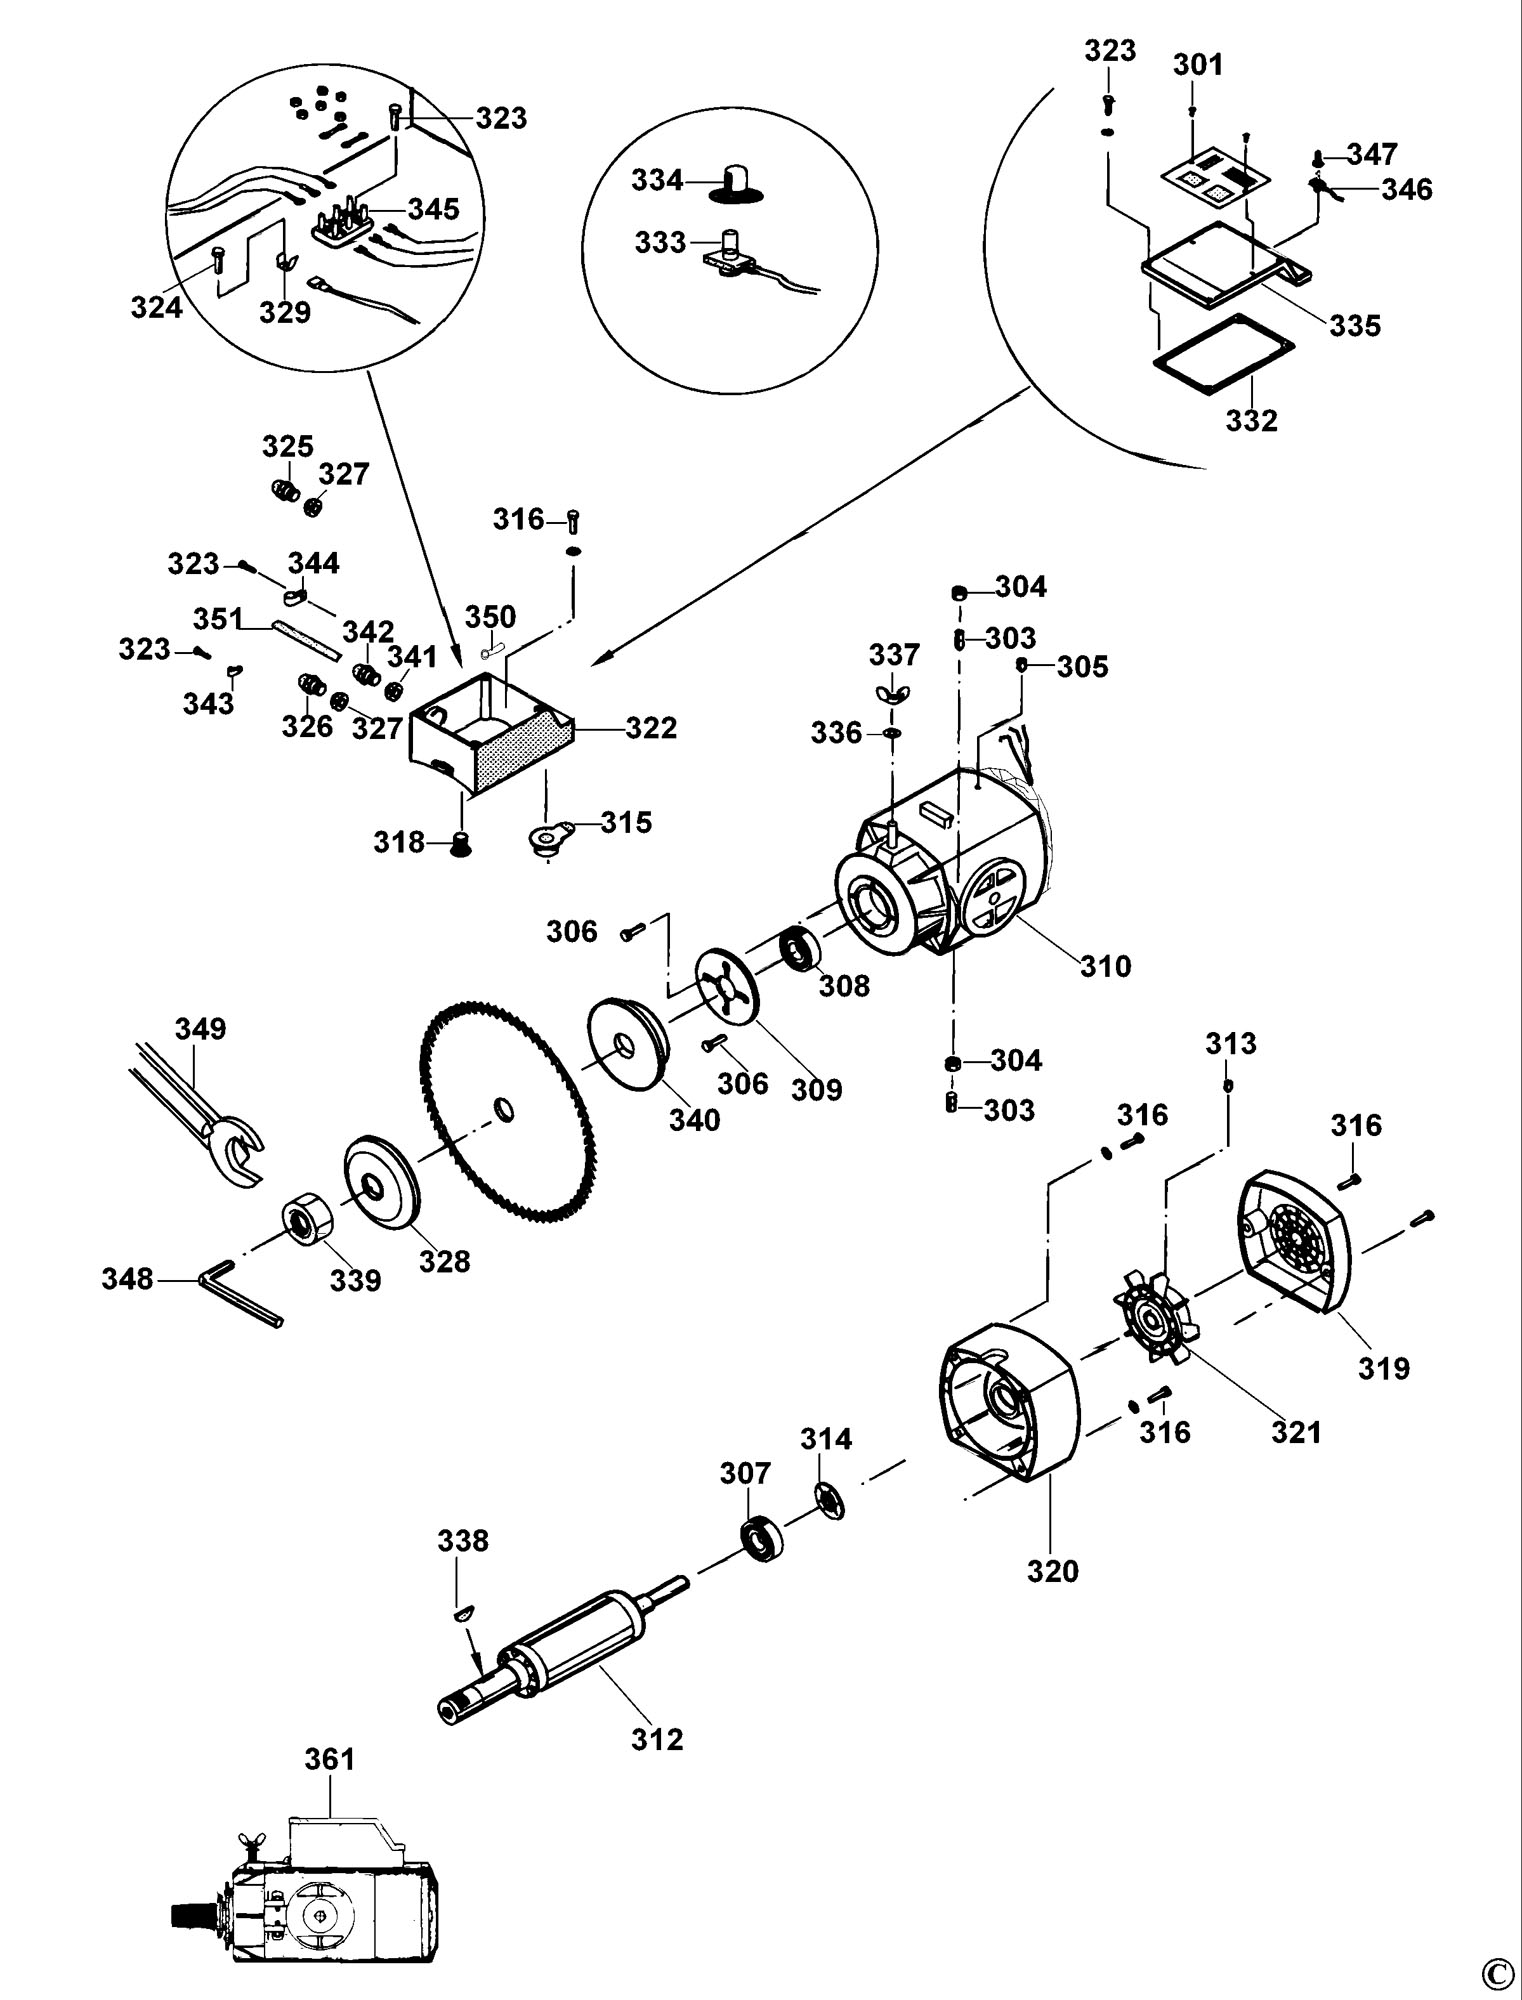 Spares For Dewalt Dw729 Radial Arm Saw  Type 2  Spare